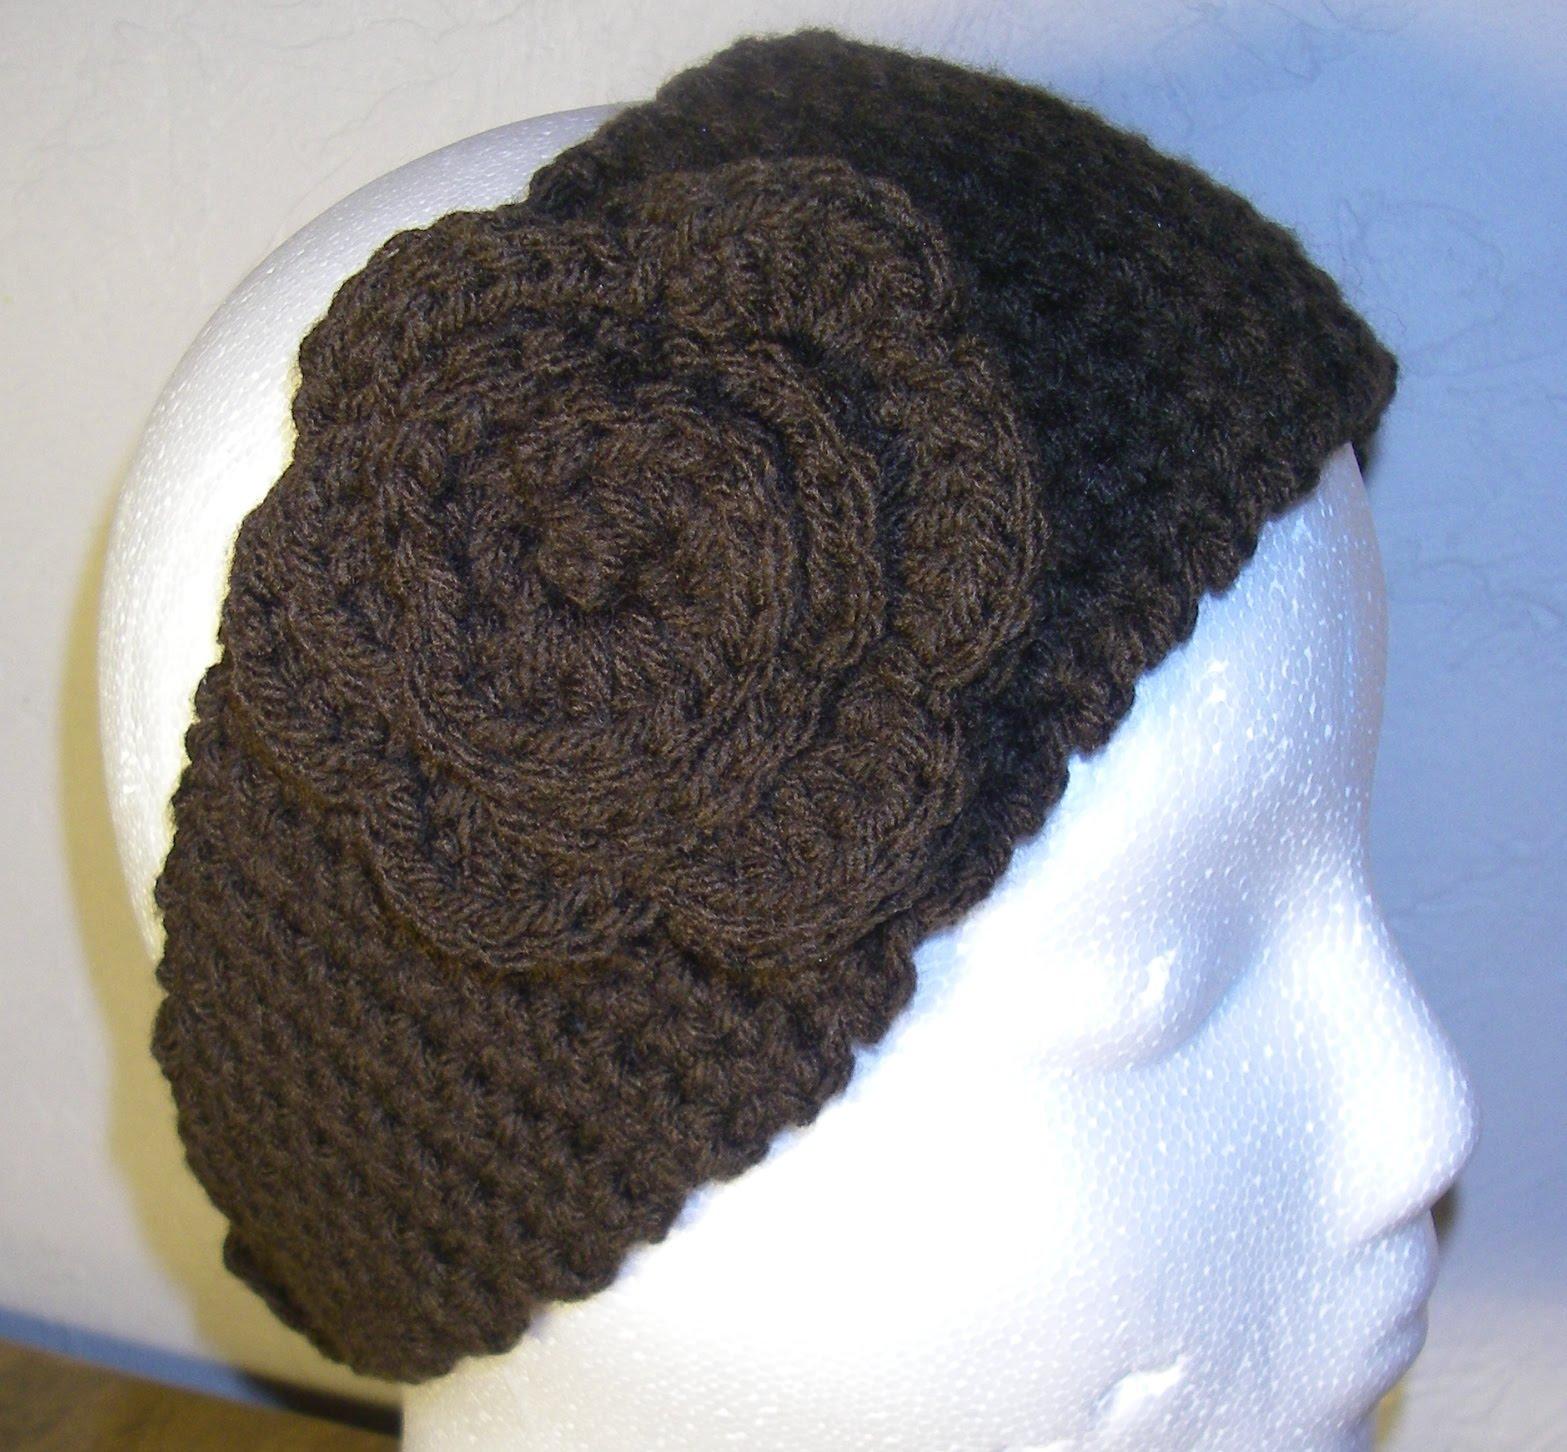 Celestial S Creations Crocheted Headband